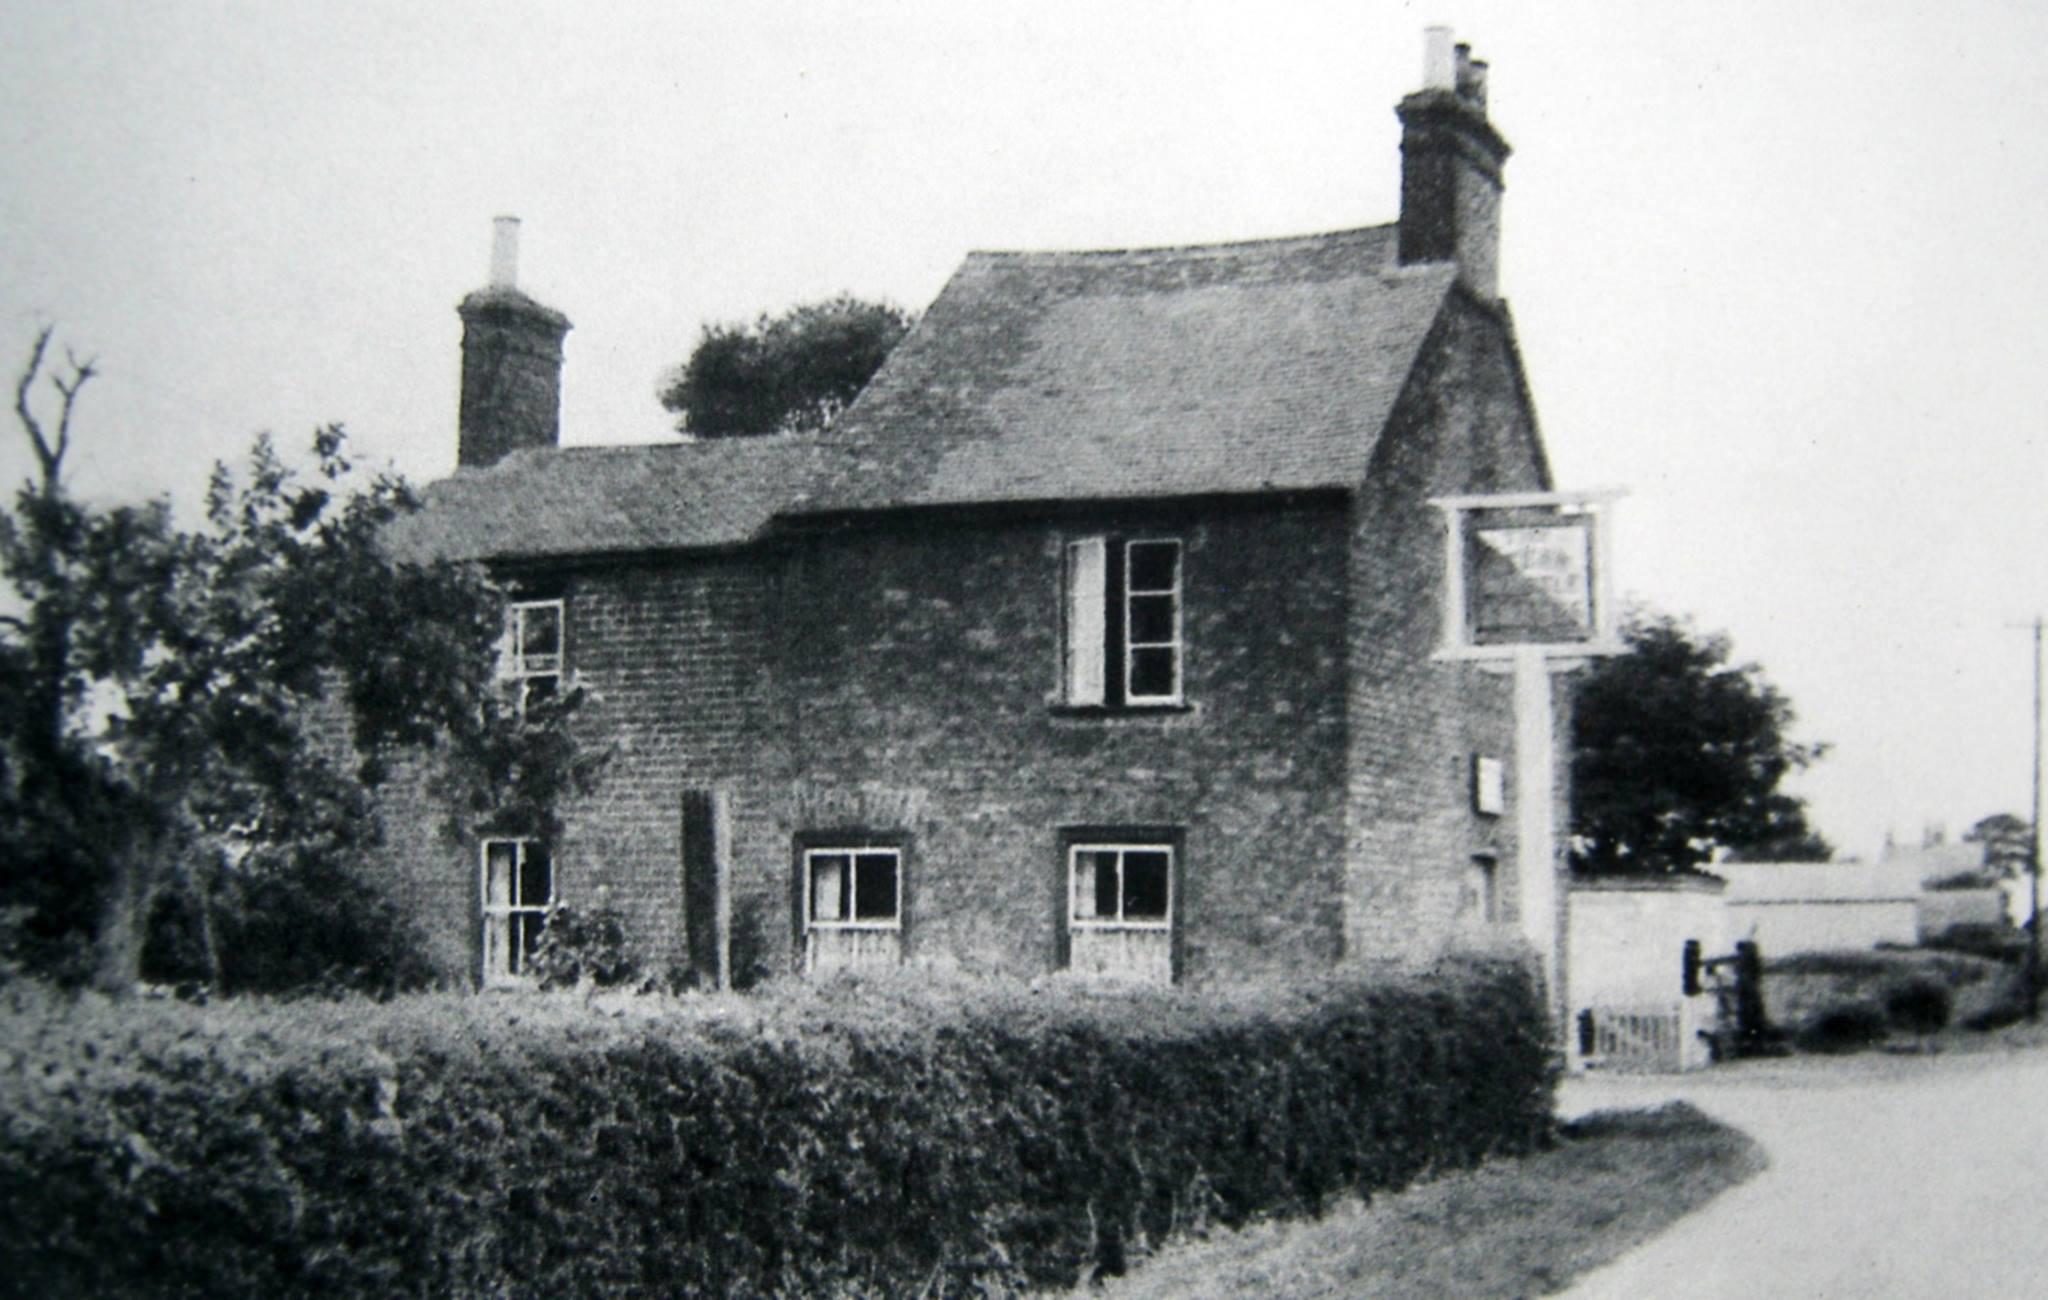 The Steam Whistle Public House, Fleet. Photo taken in 1950.